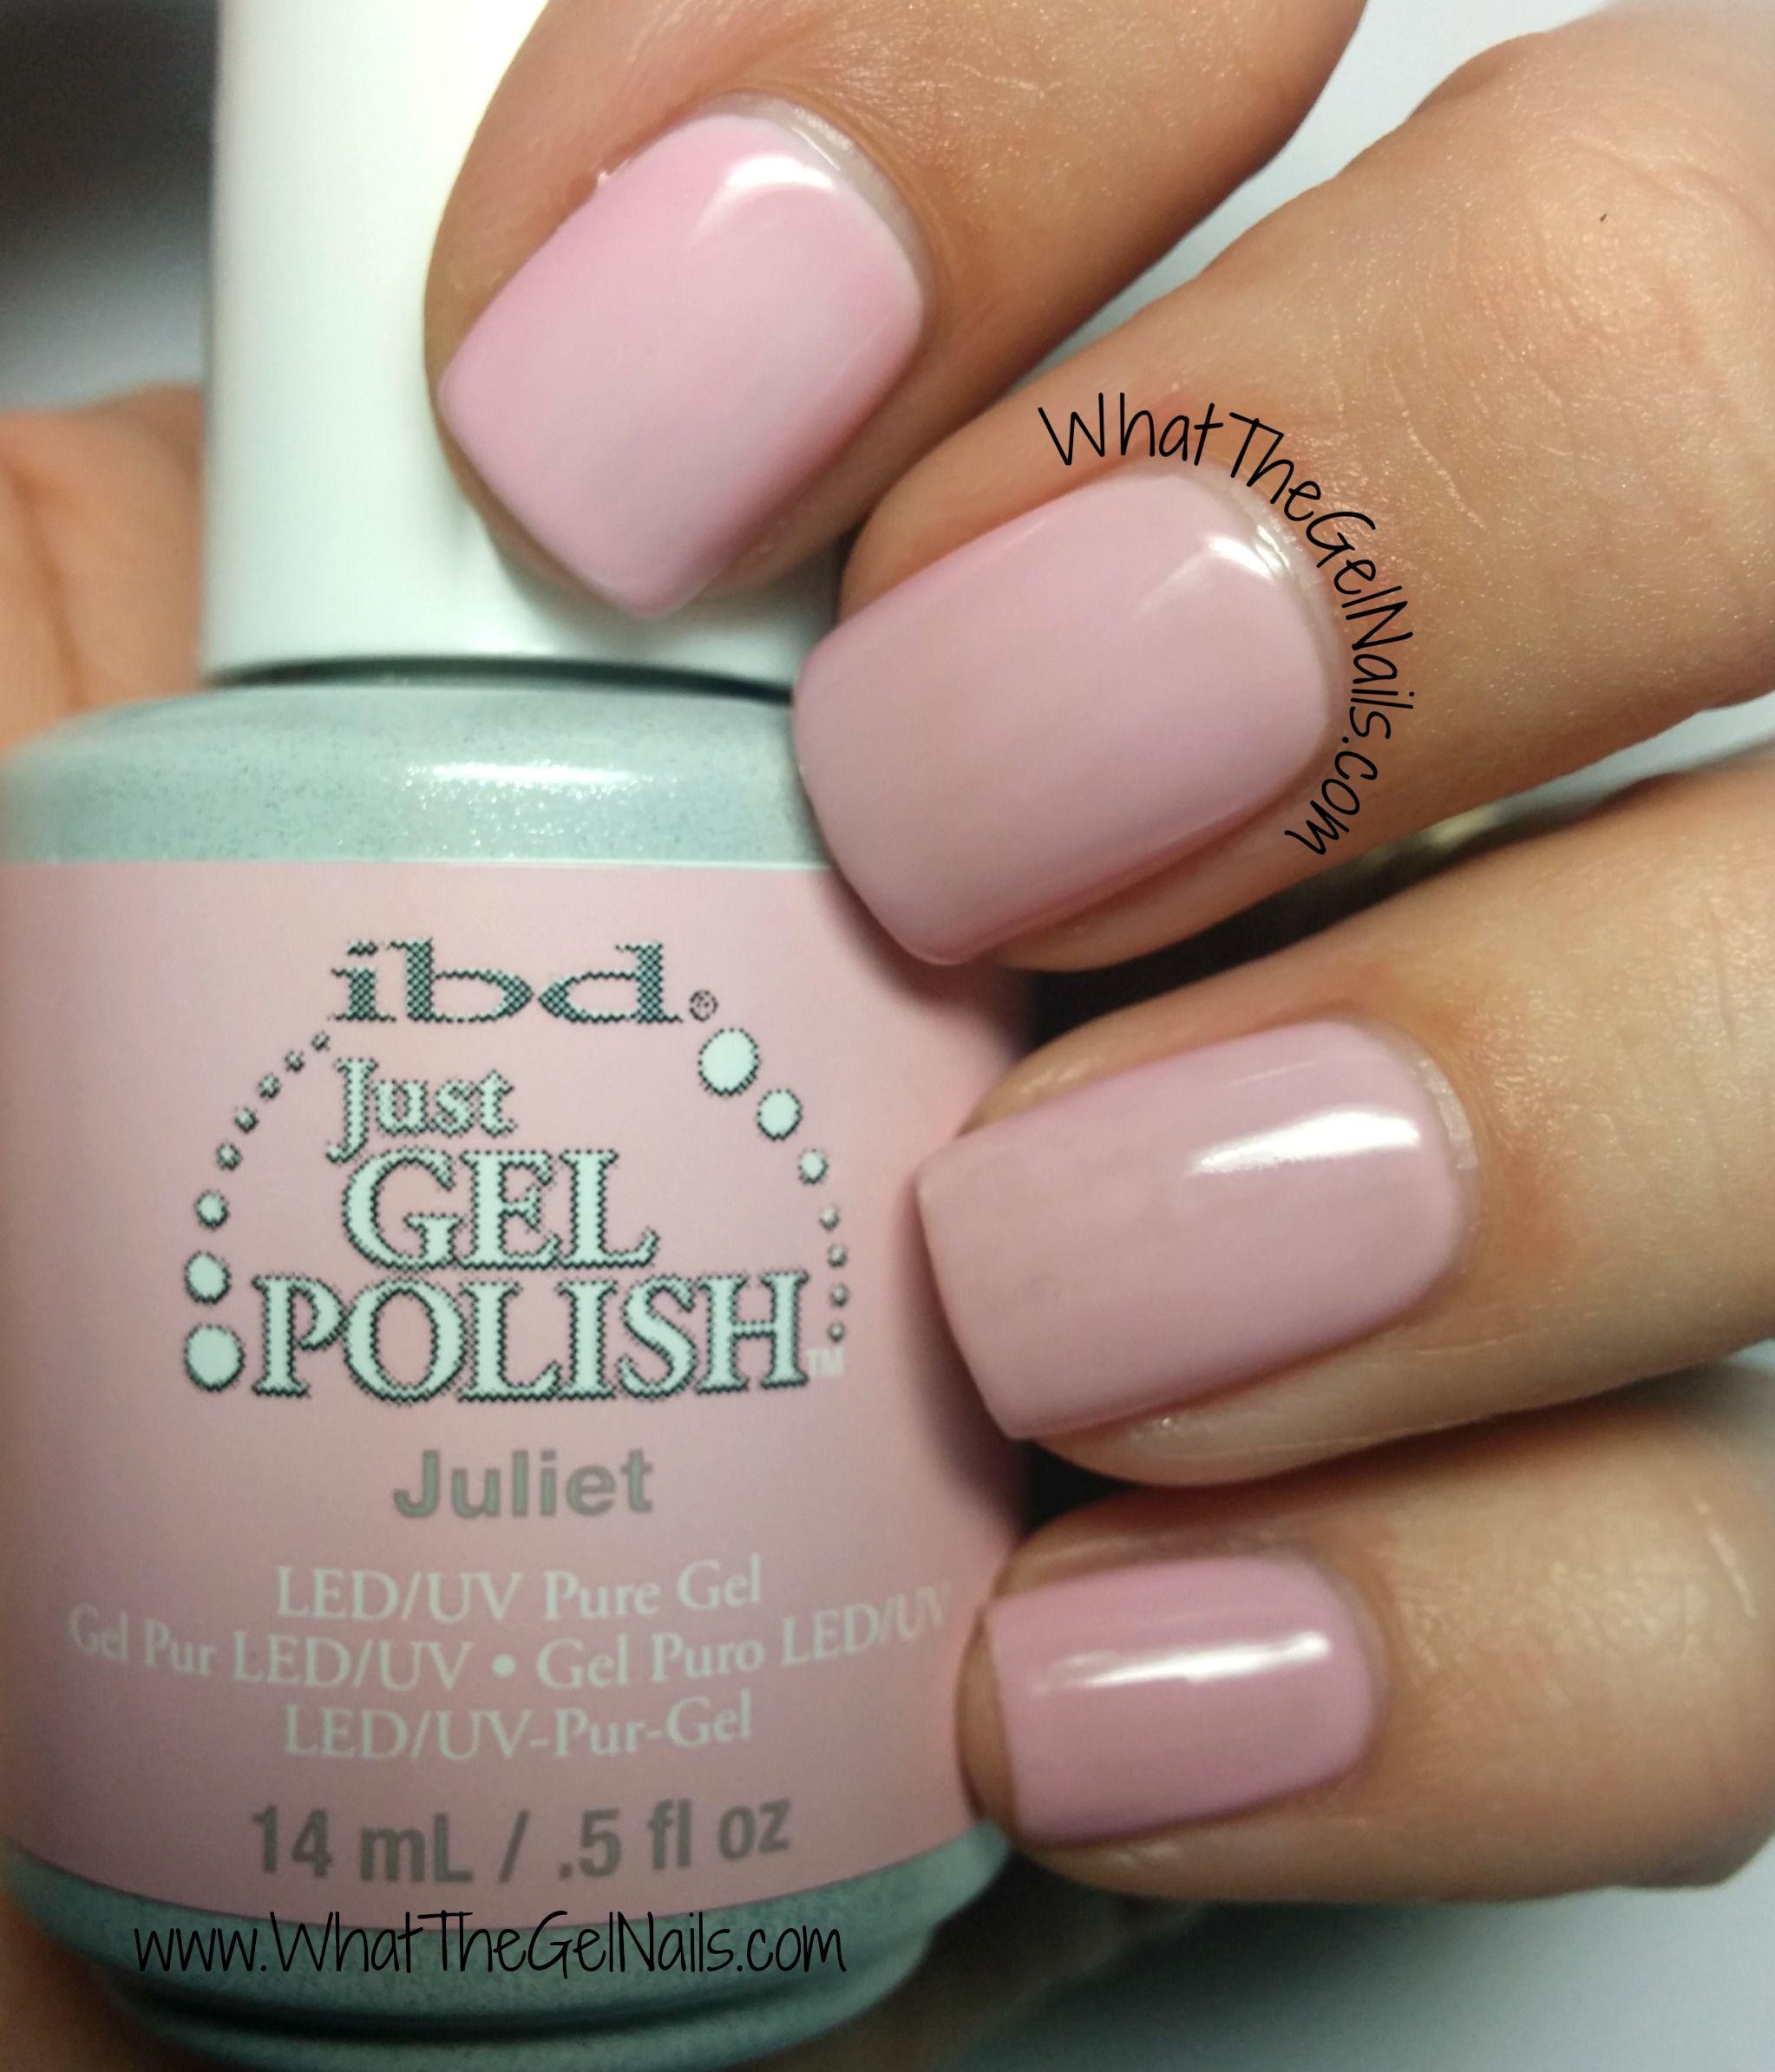 IBD Juliet plus more springy gel polish colors.   Nail Files ...